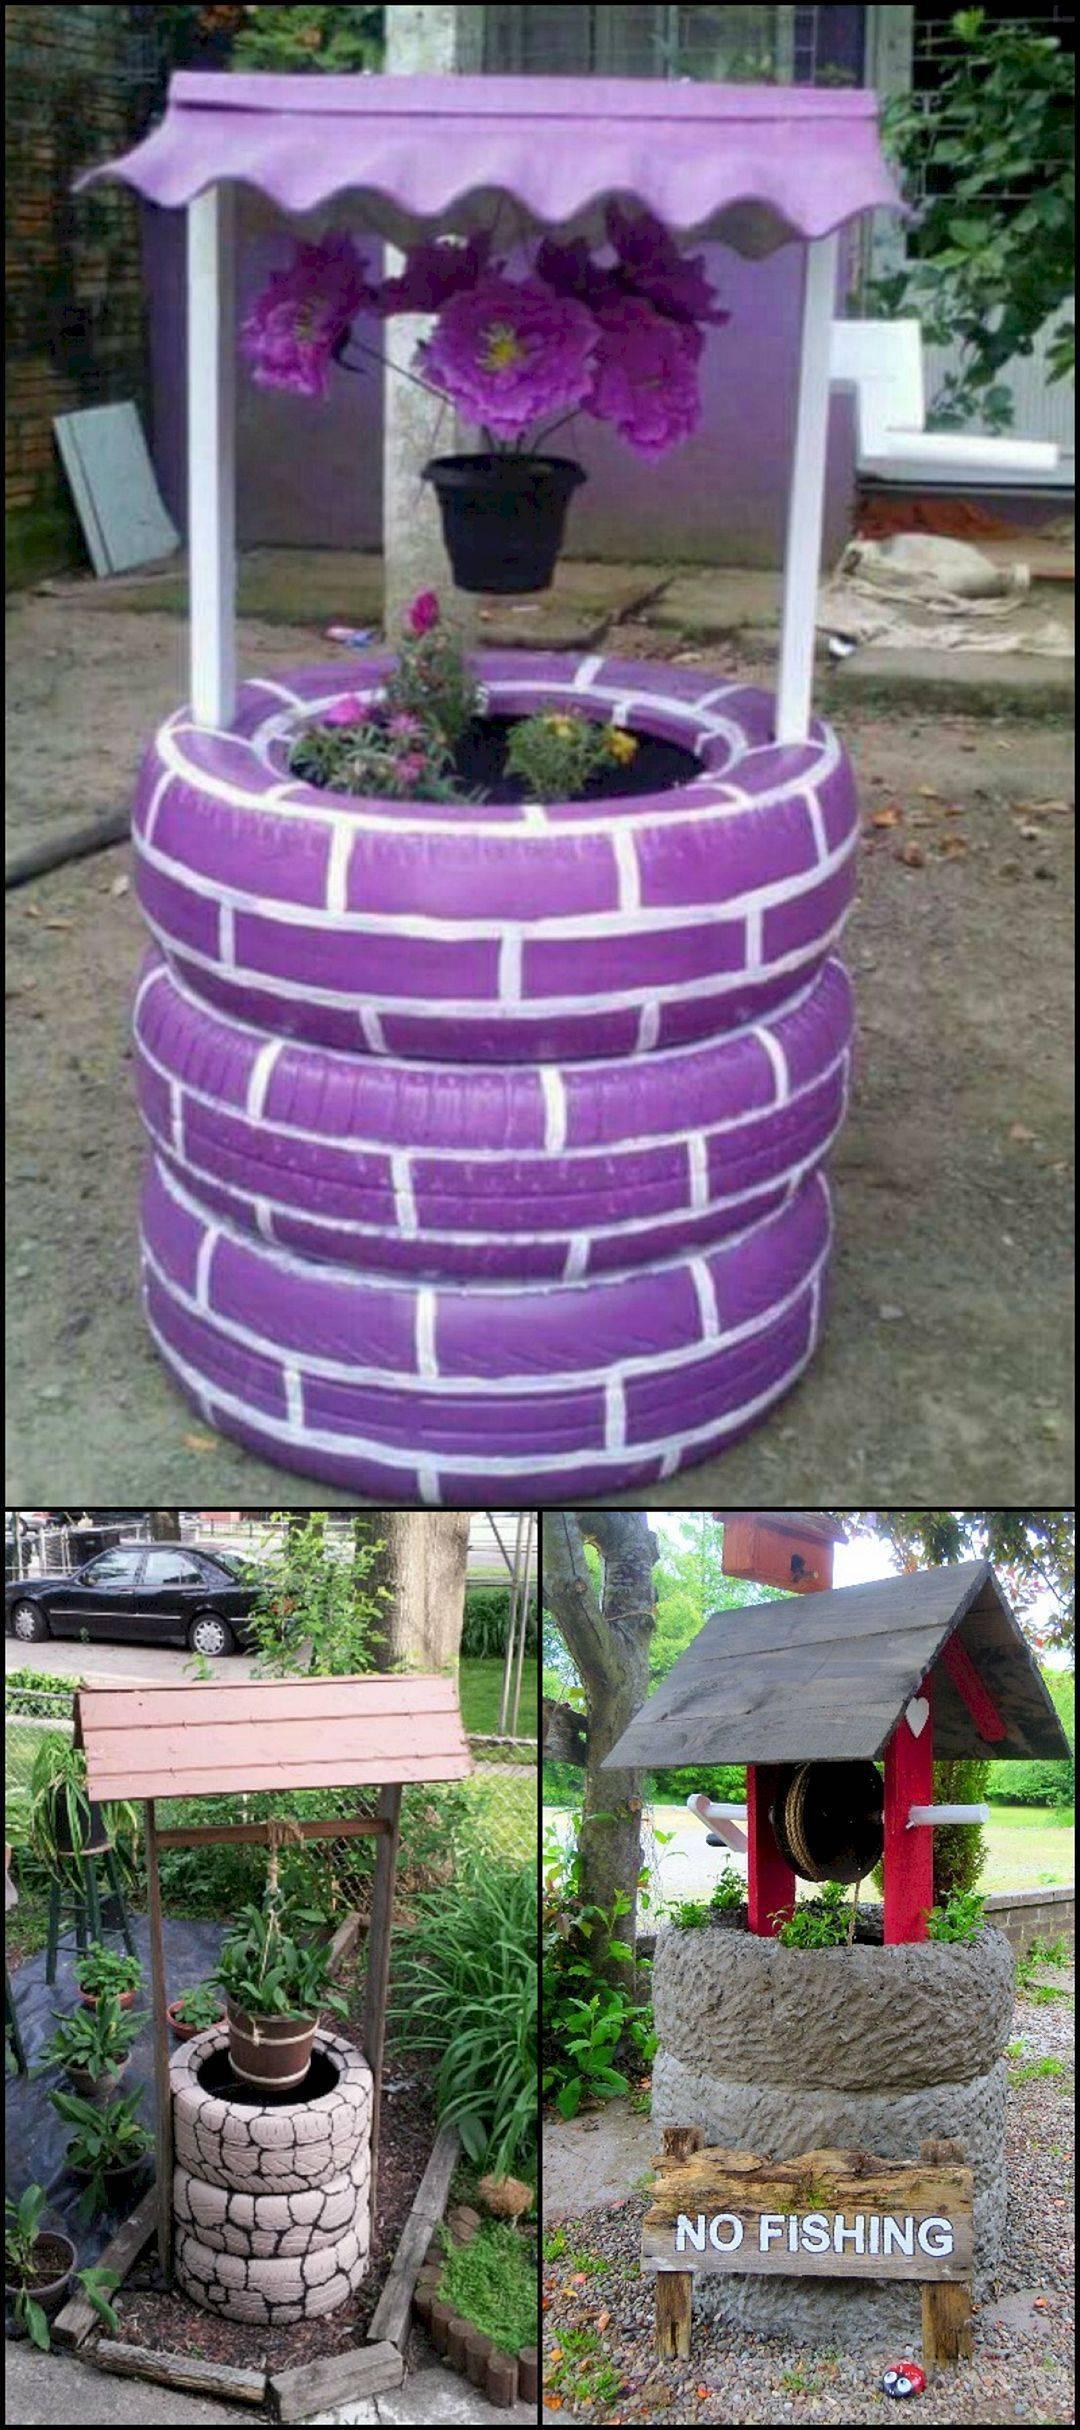 diy garden easy-367887863302074604